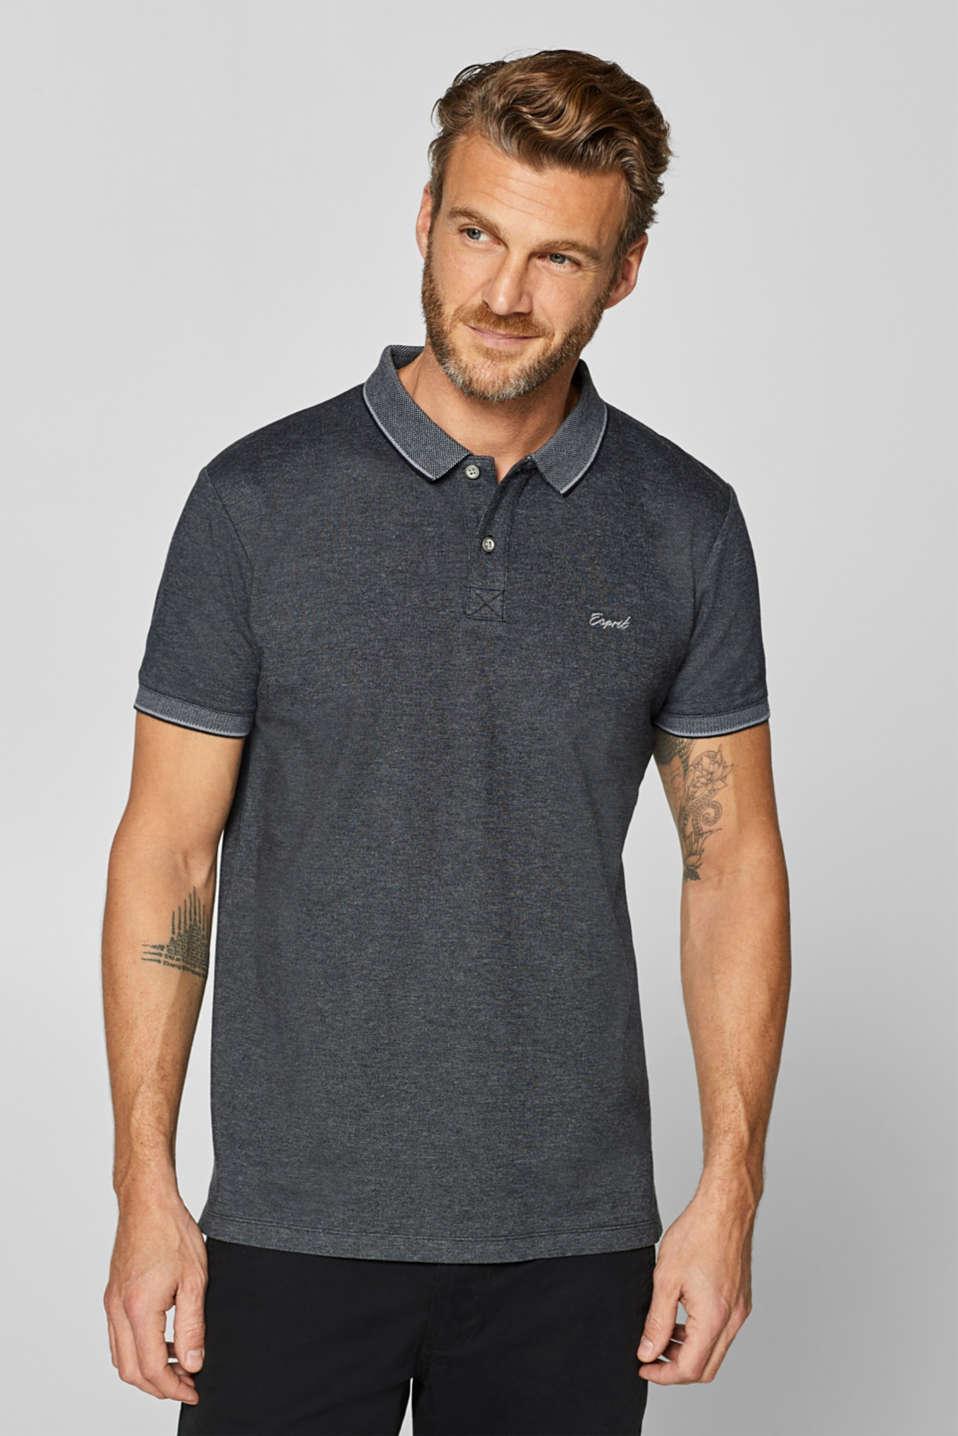 Piqué polo shirt in blended cotton